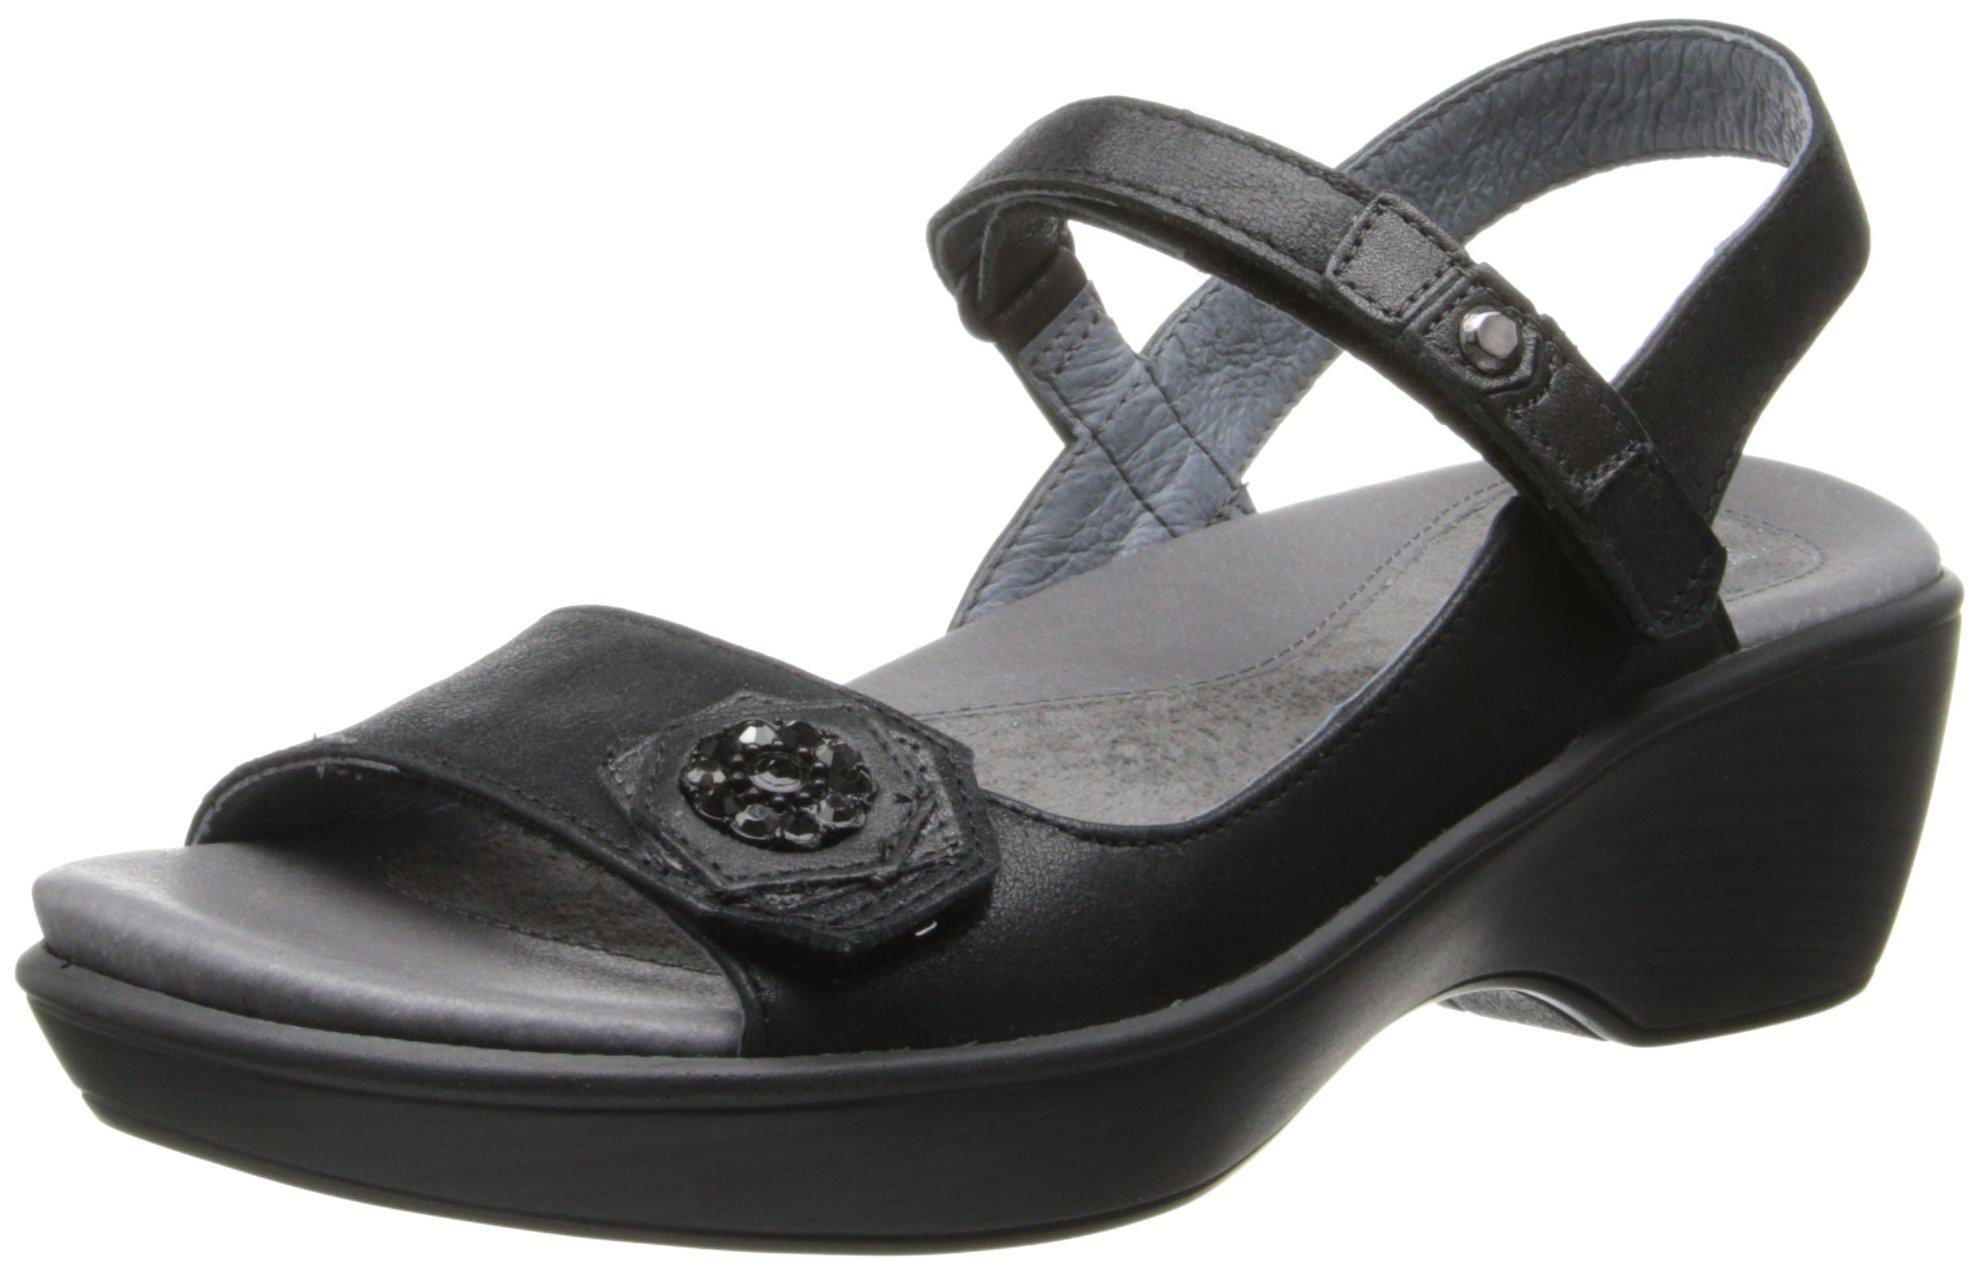 Naot Women's Reserve Dress Sandal, Black, 39 EU/8 M US by NAOT